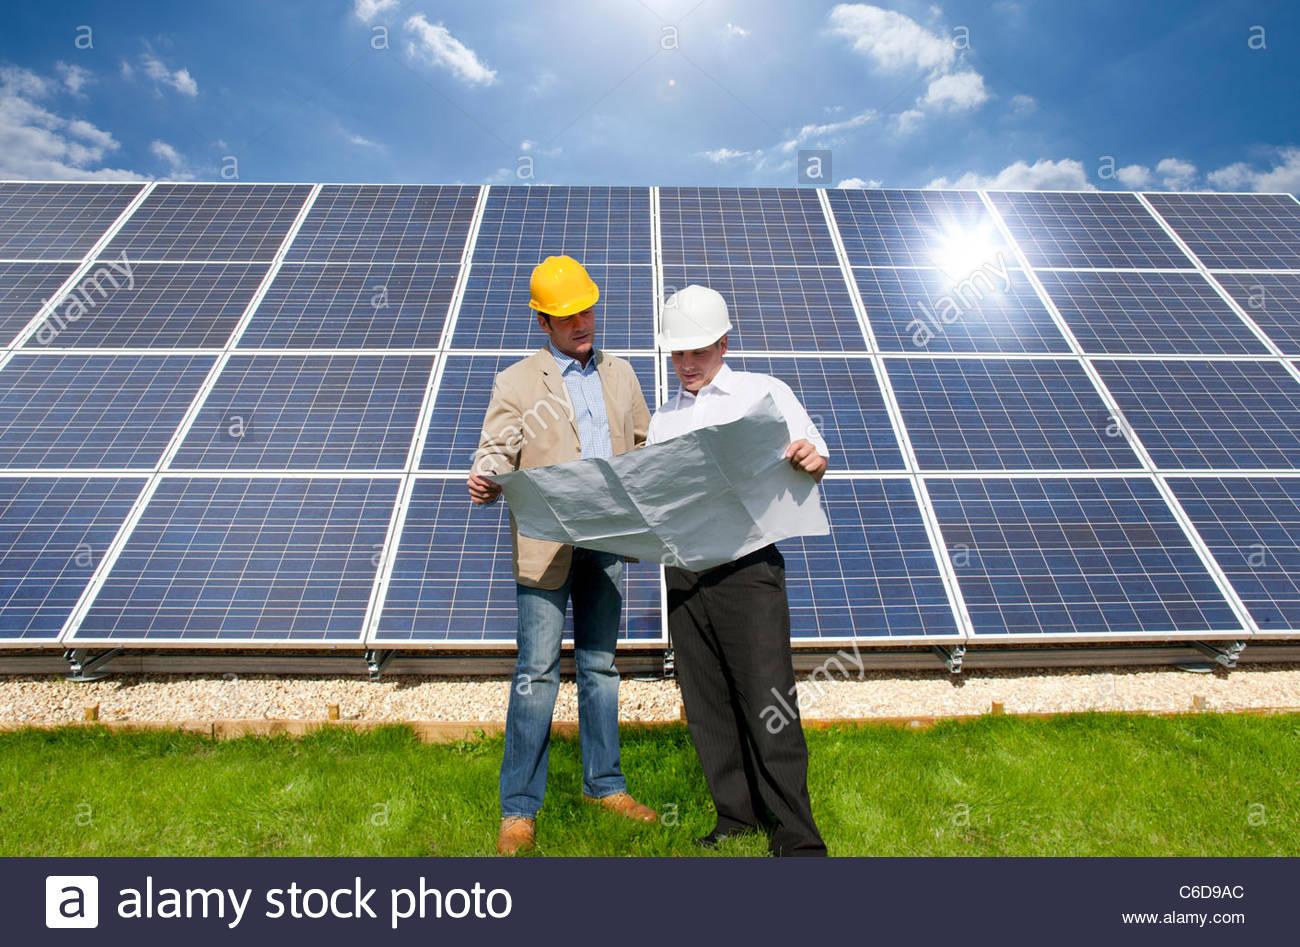 Technicians holding blueprints talking near large solar panels - Stock Image